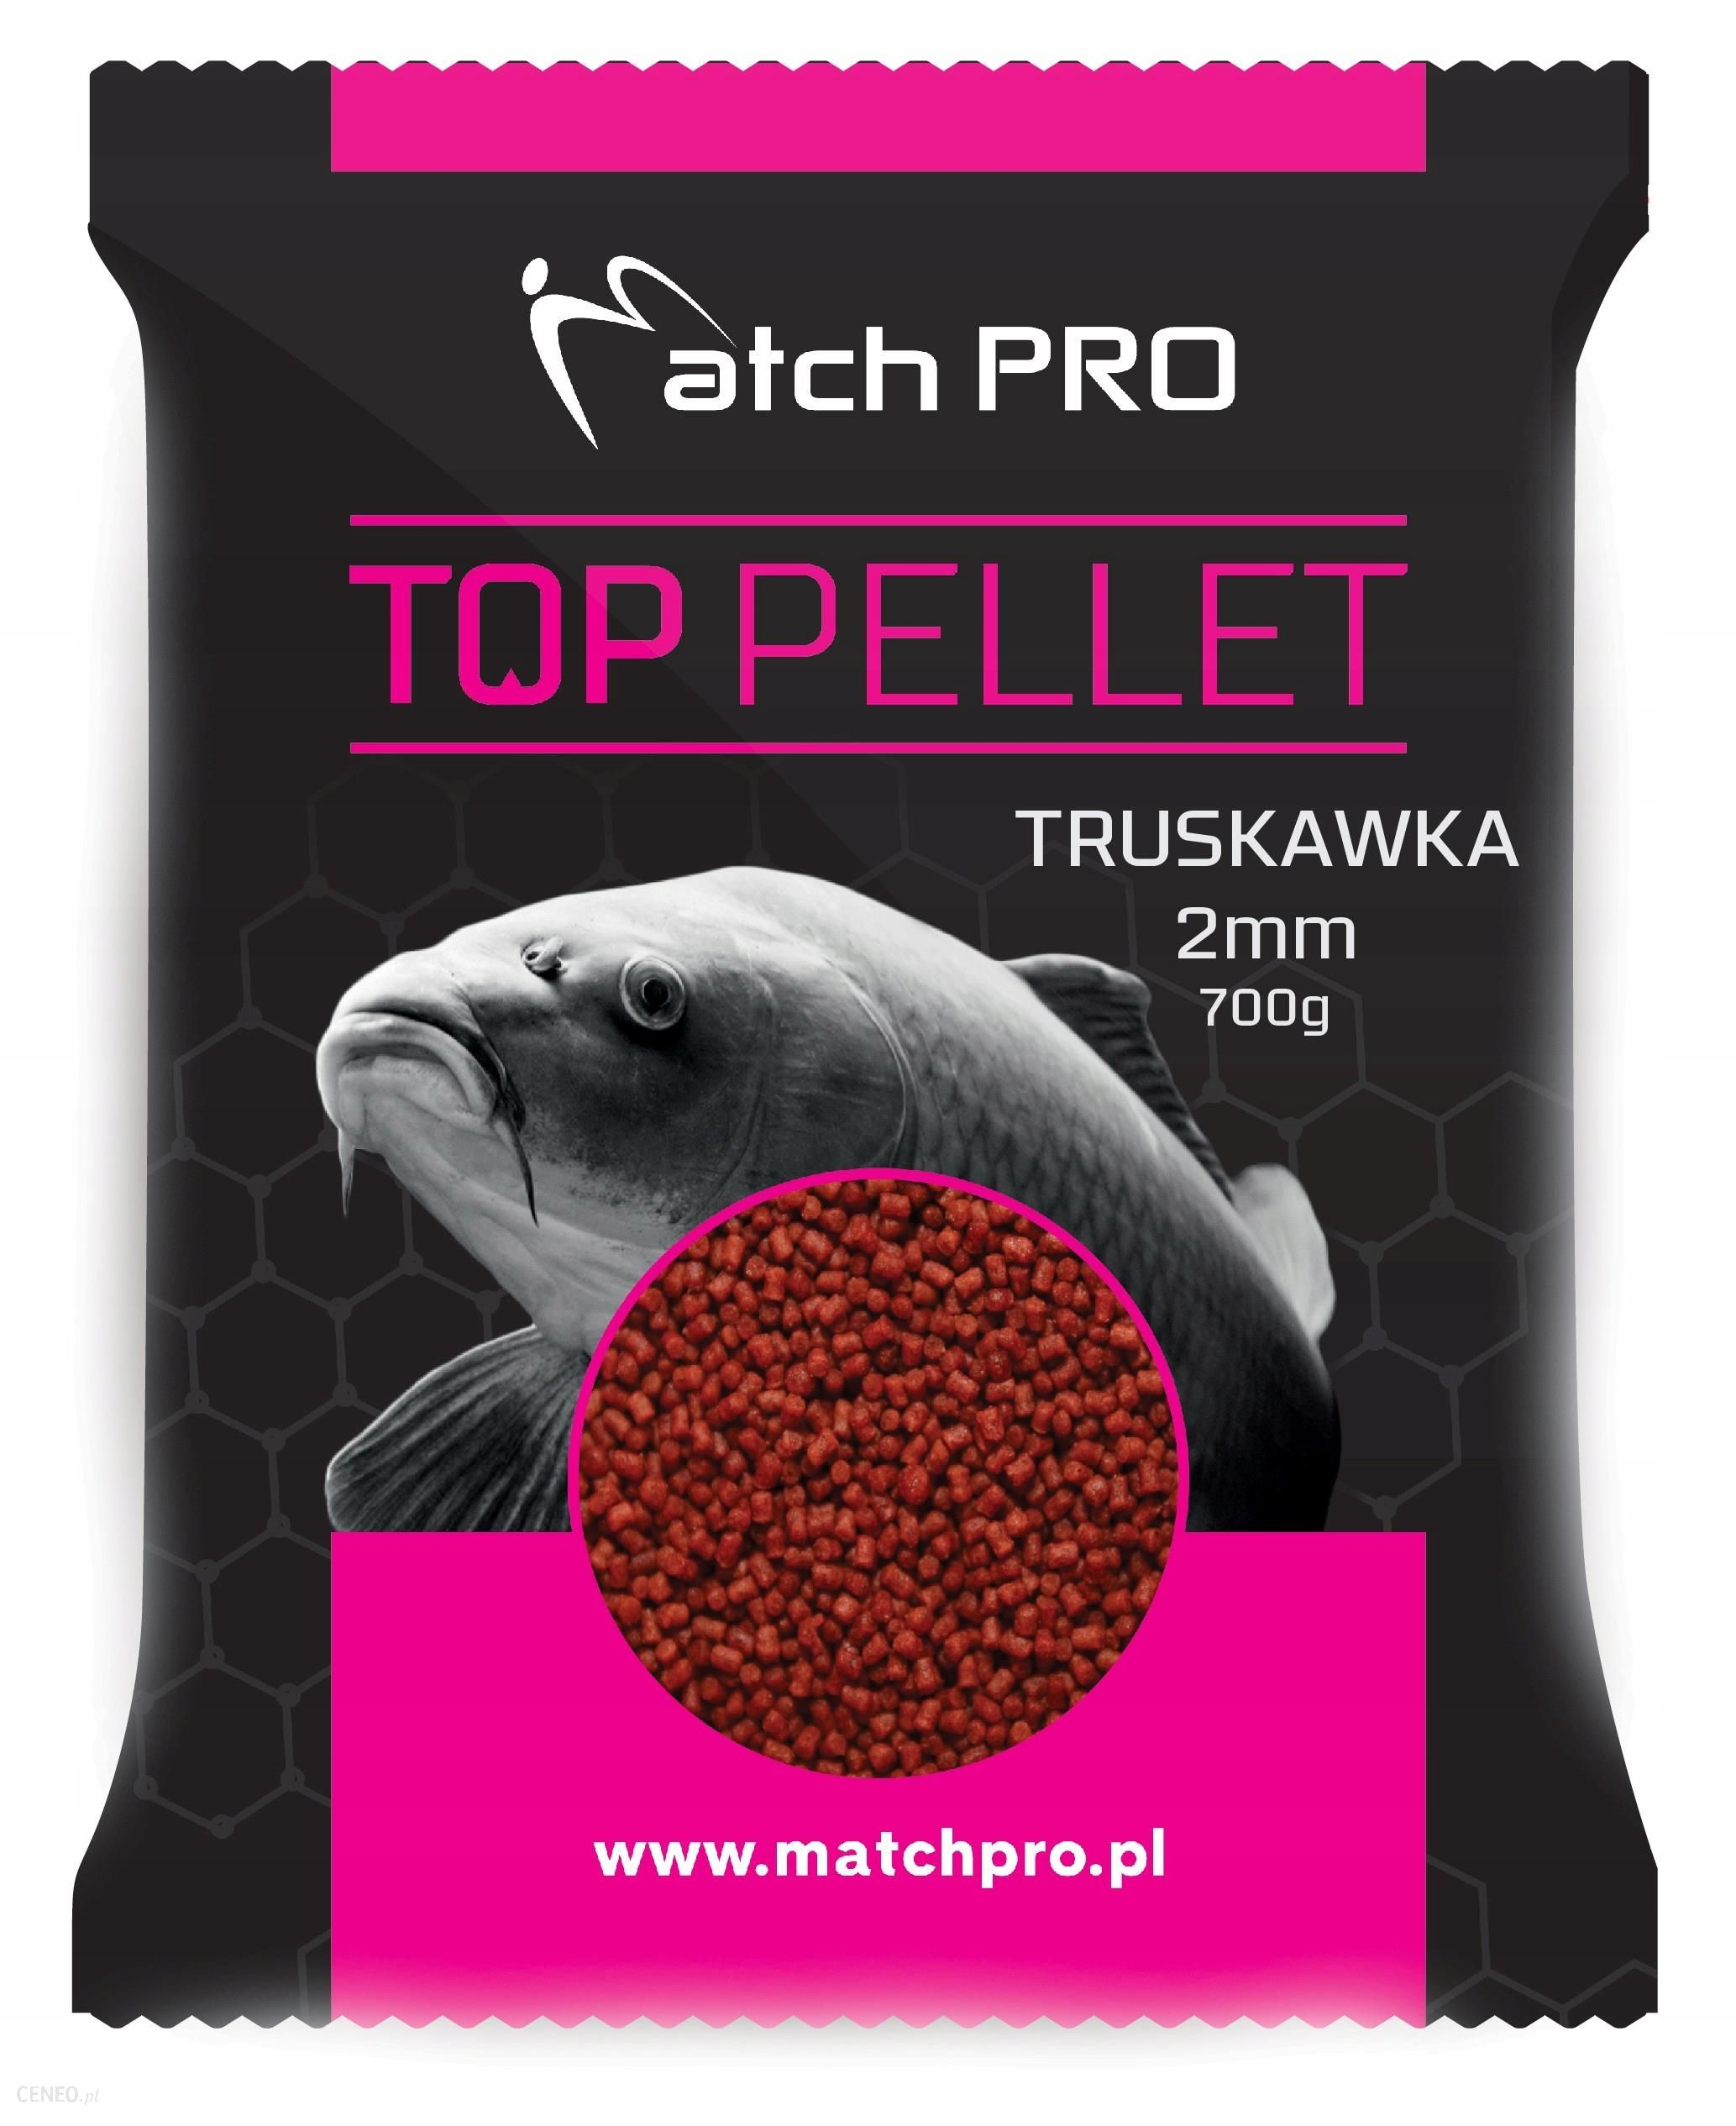 MATCH PRO MATCHPRO TOP PELLET RED HALIBUT TRUSKAWKA 2MM 700G 977813